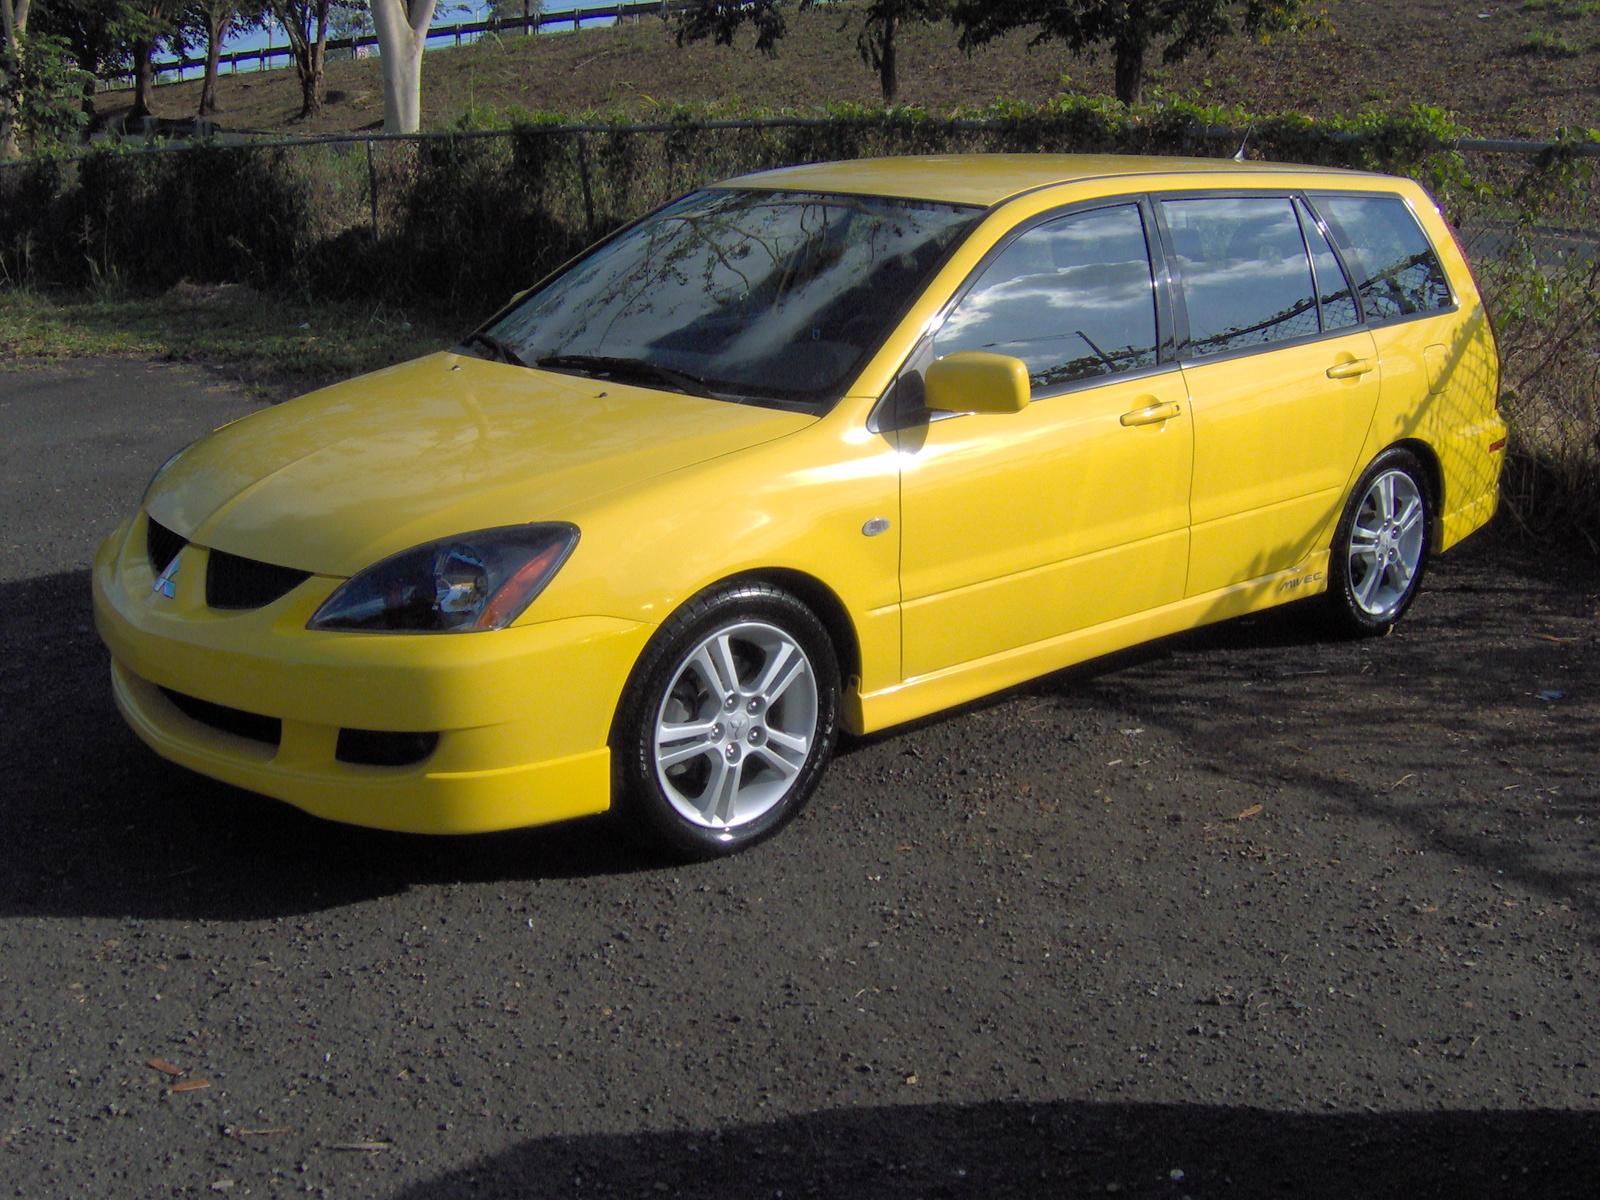 2004 Mitsubishi Lancer Sportback Pictures Cargurus